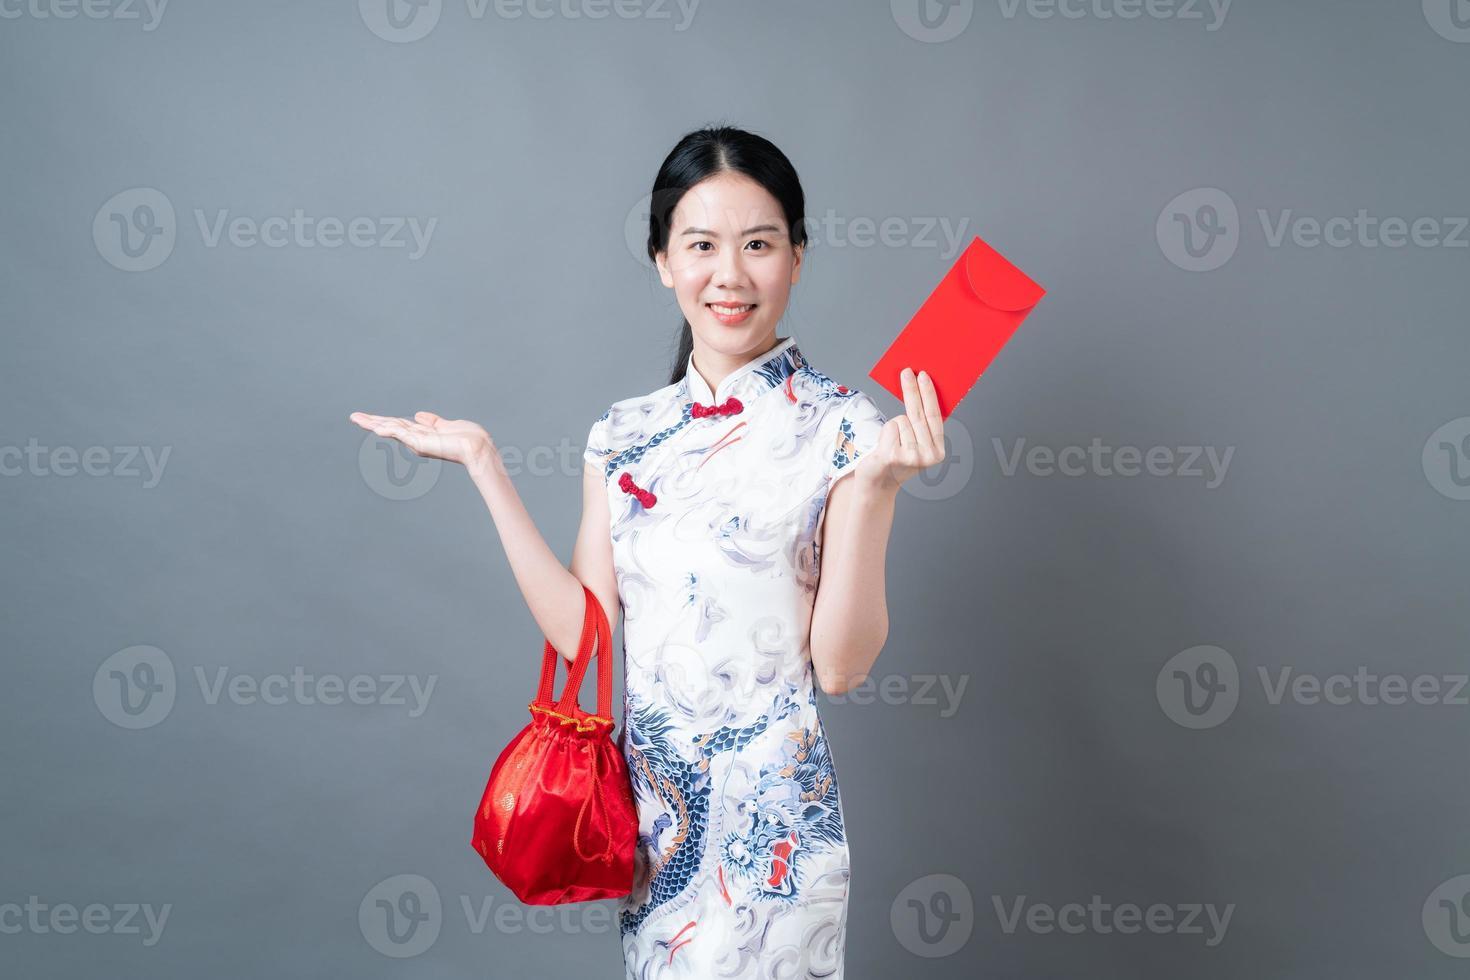 Mujer asiática vistiendo traje tradicional chino con sobre rojo o paquete rojo foto